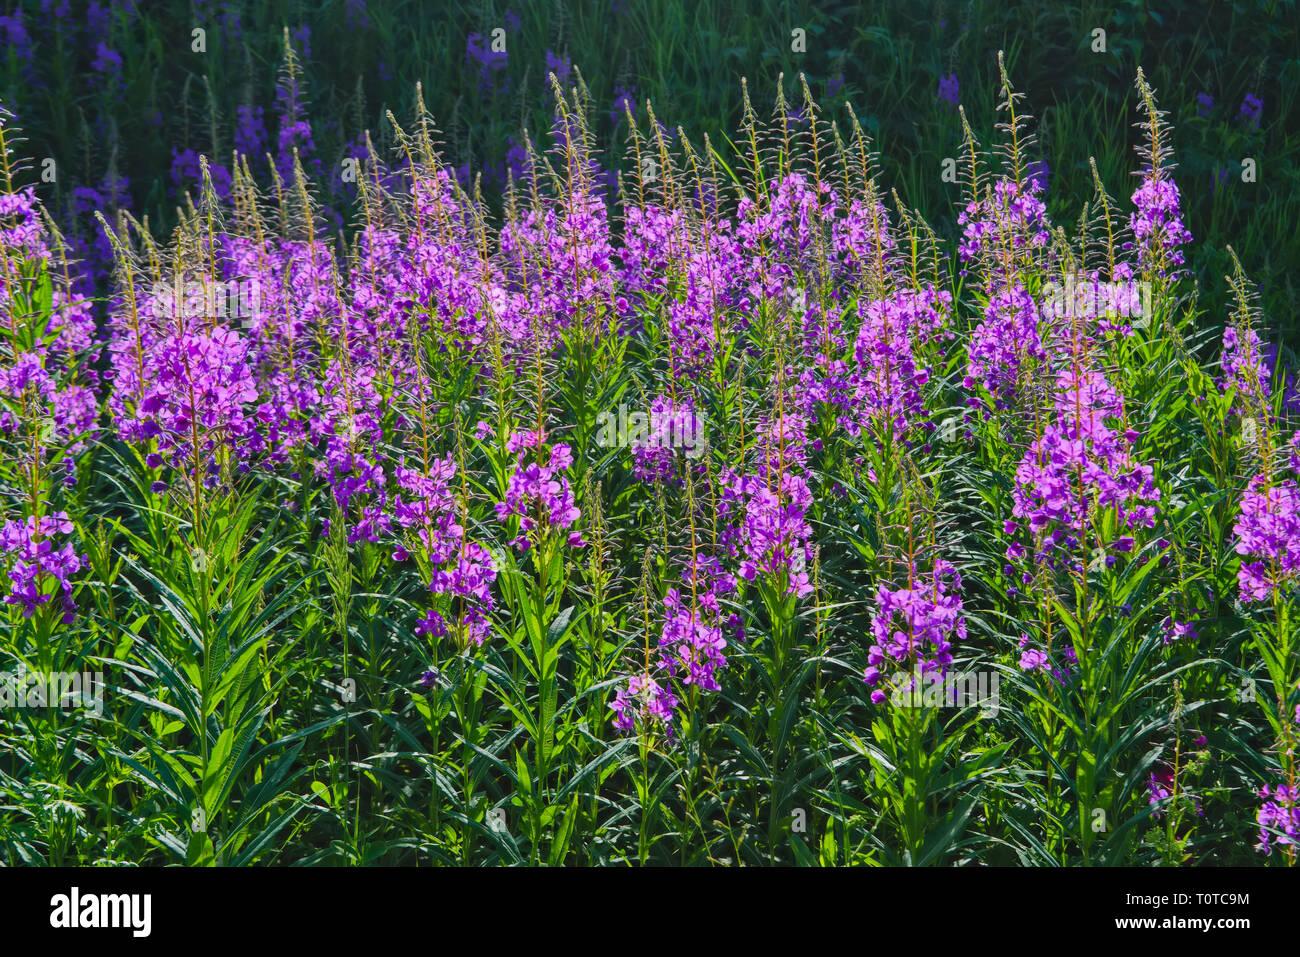 Big field of rosebay willowherb Chamerion angustifolium flowering with pink flowers Stock Photo